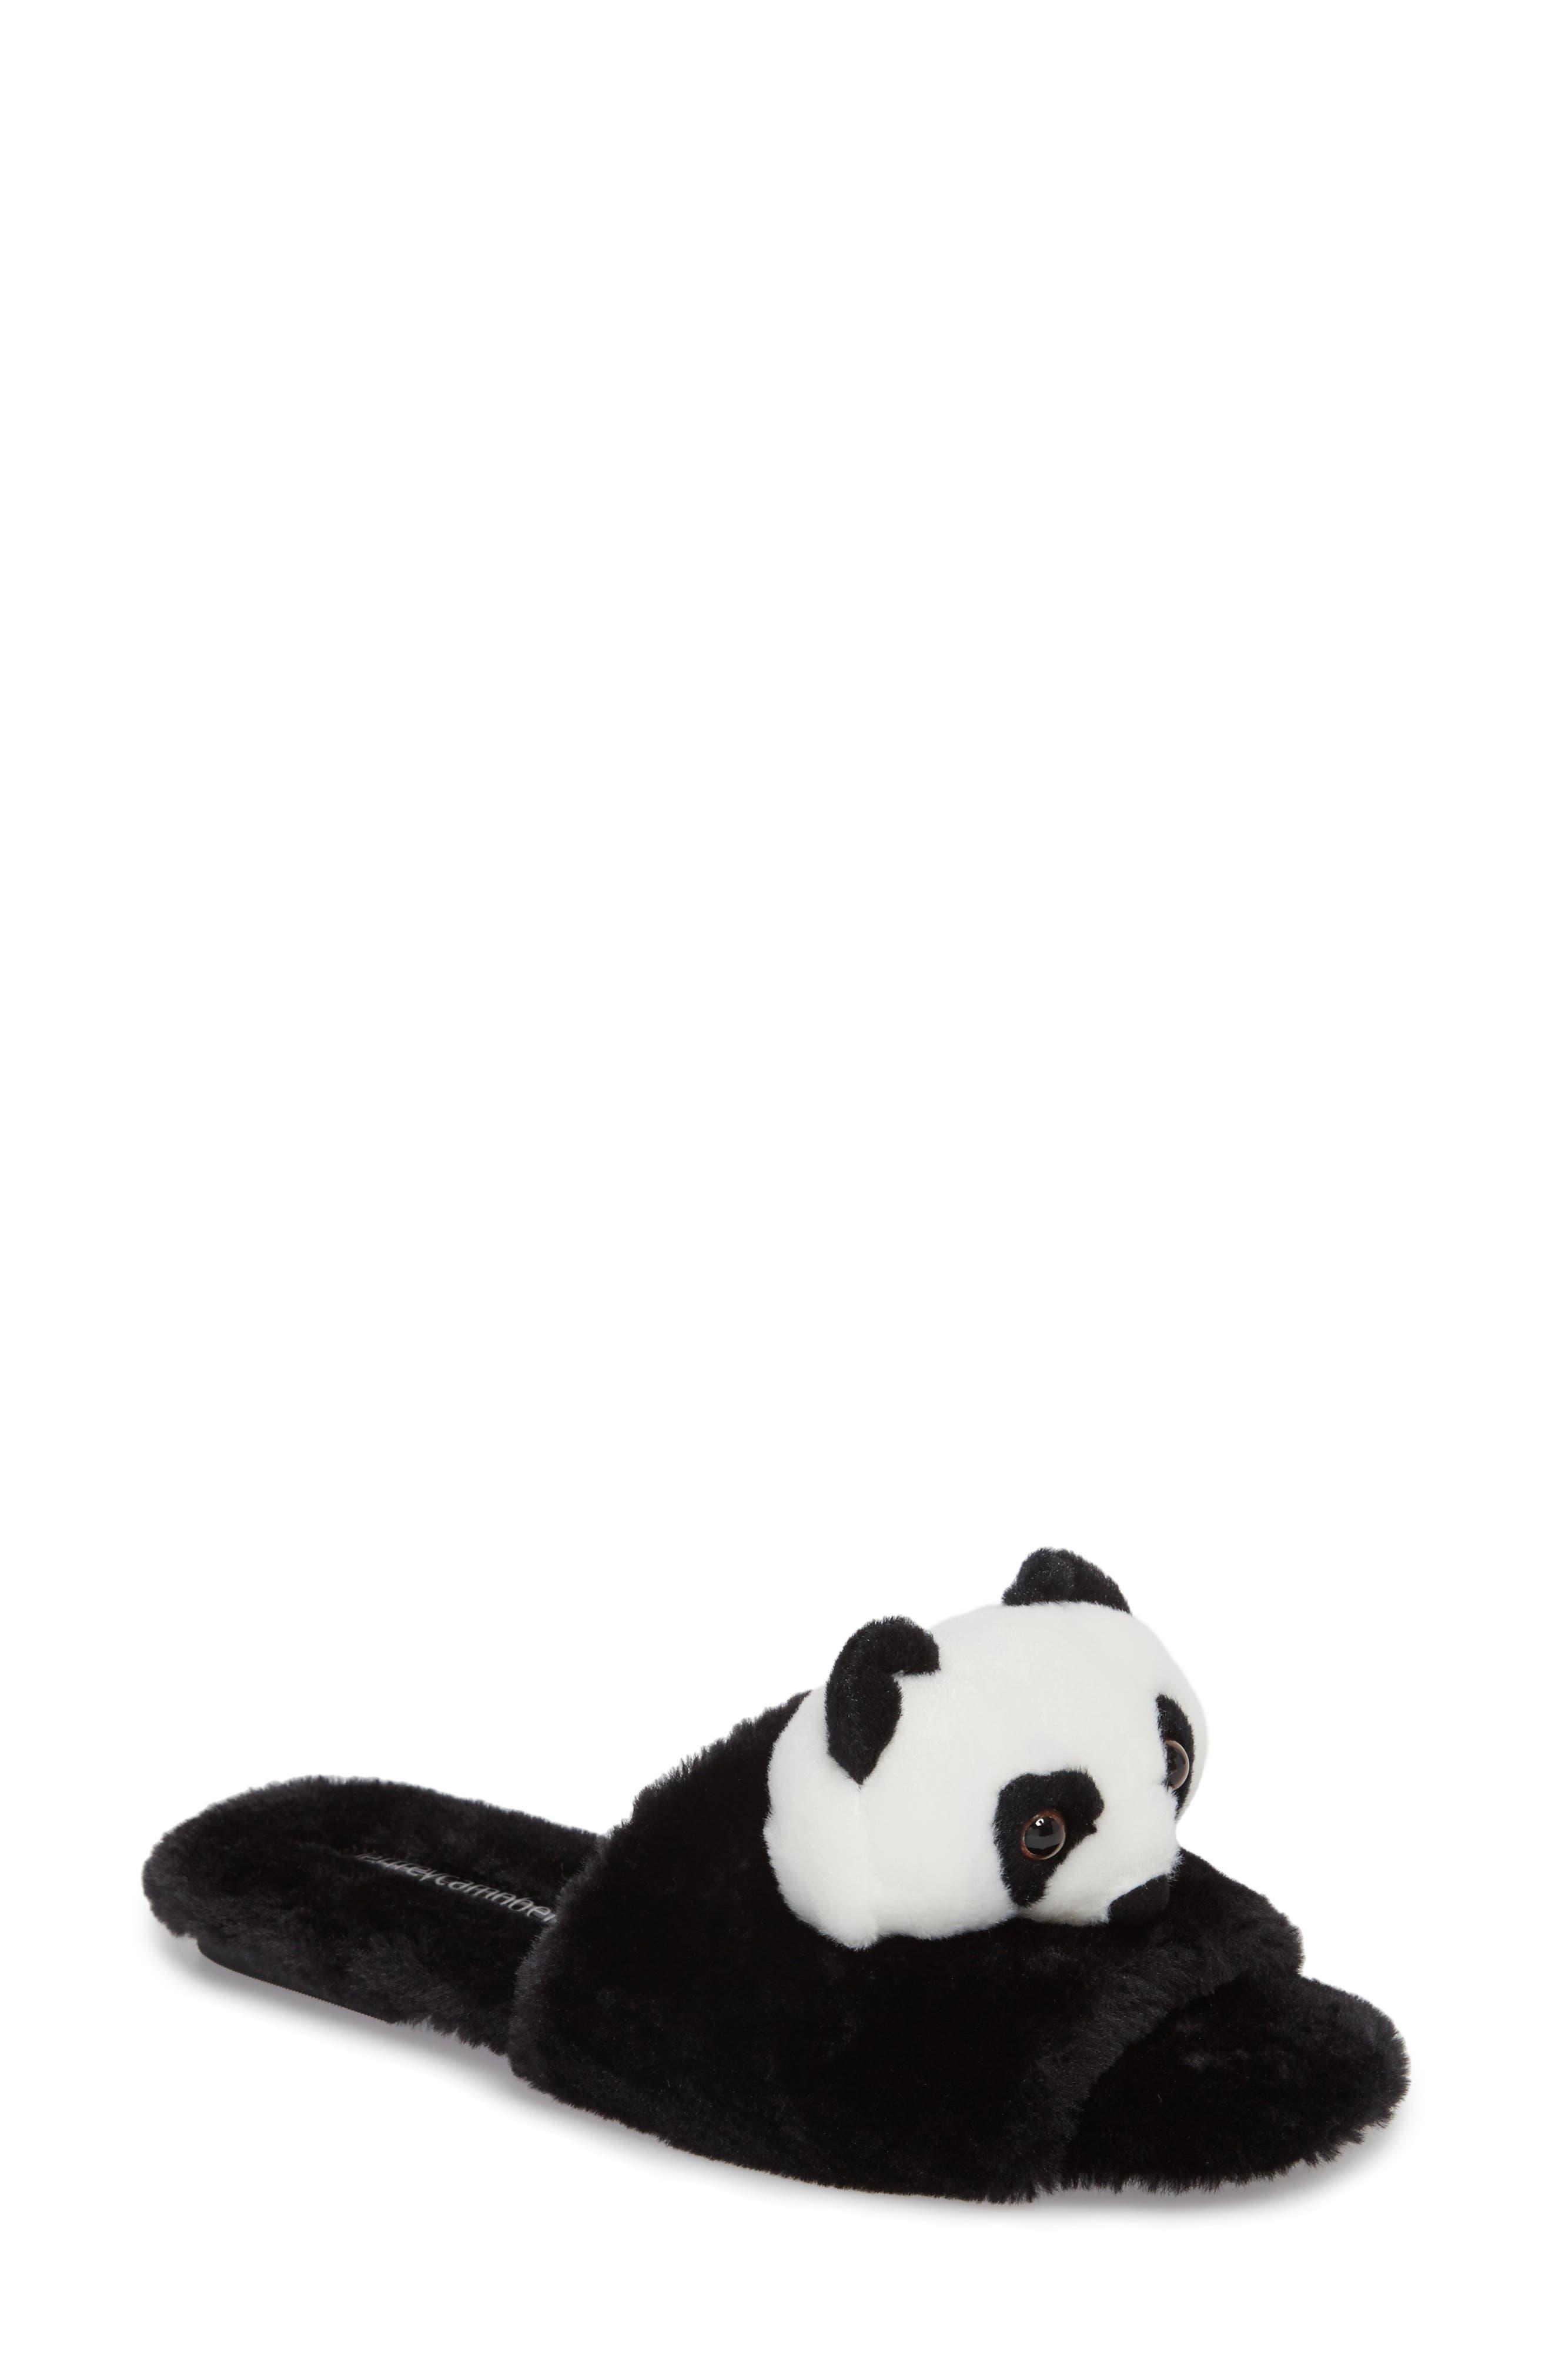 Plush Animal Slipper,                         Main,                         color, Black Faux Fur